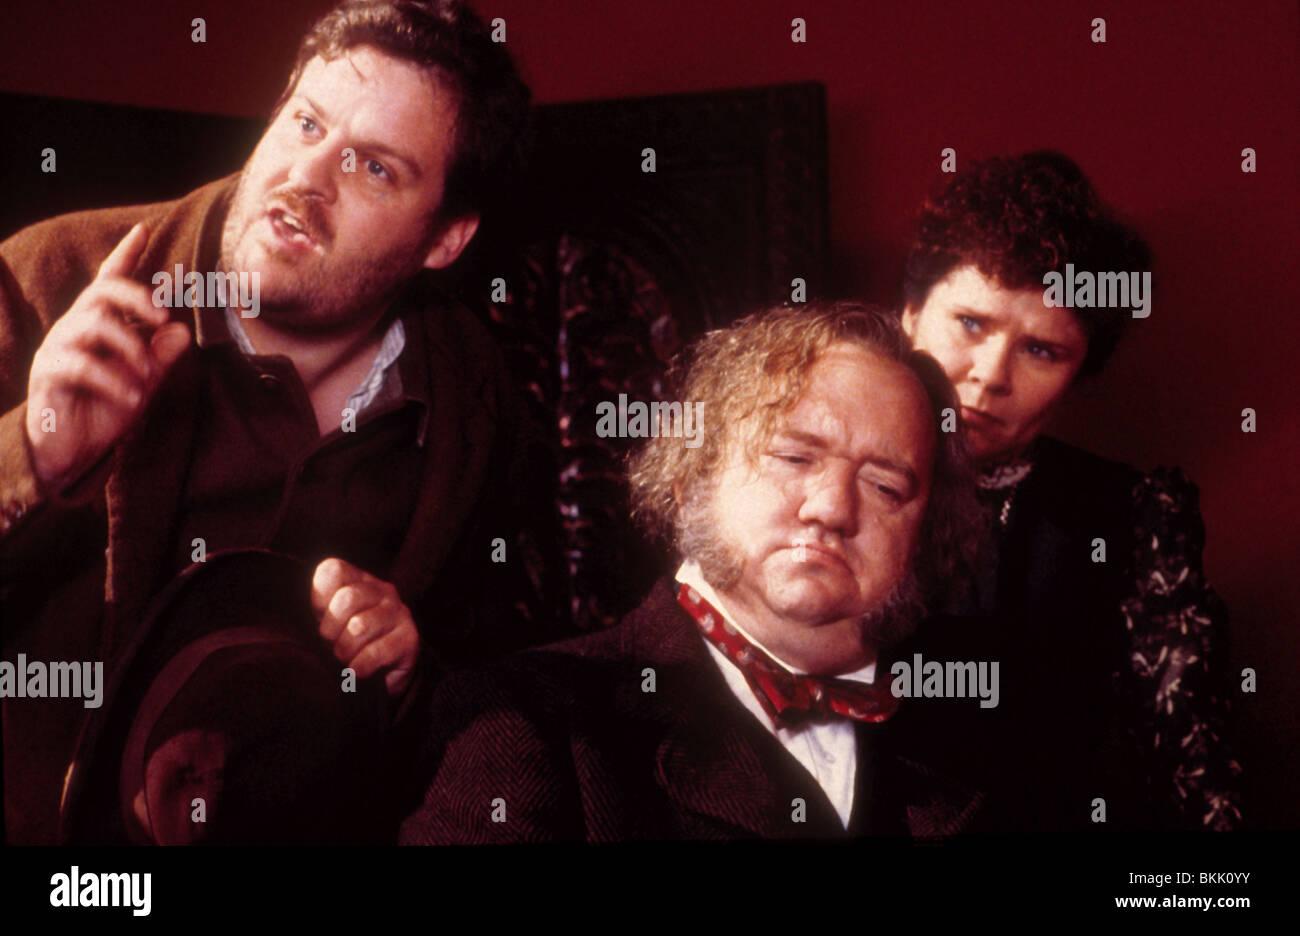 TWELFTH NIGHT (1996) MEL SMITH, IMELDA STAUNTON TNT 027 - Stock Image